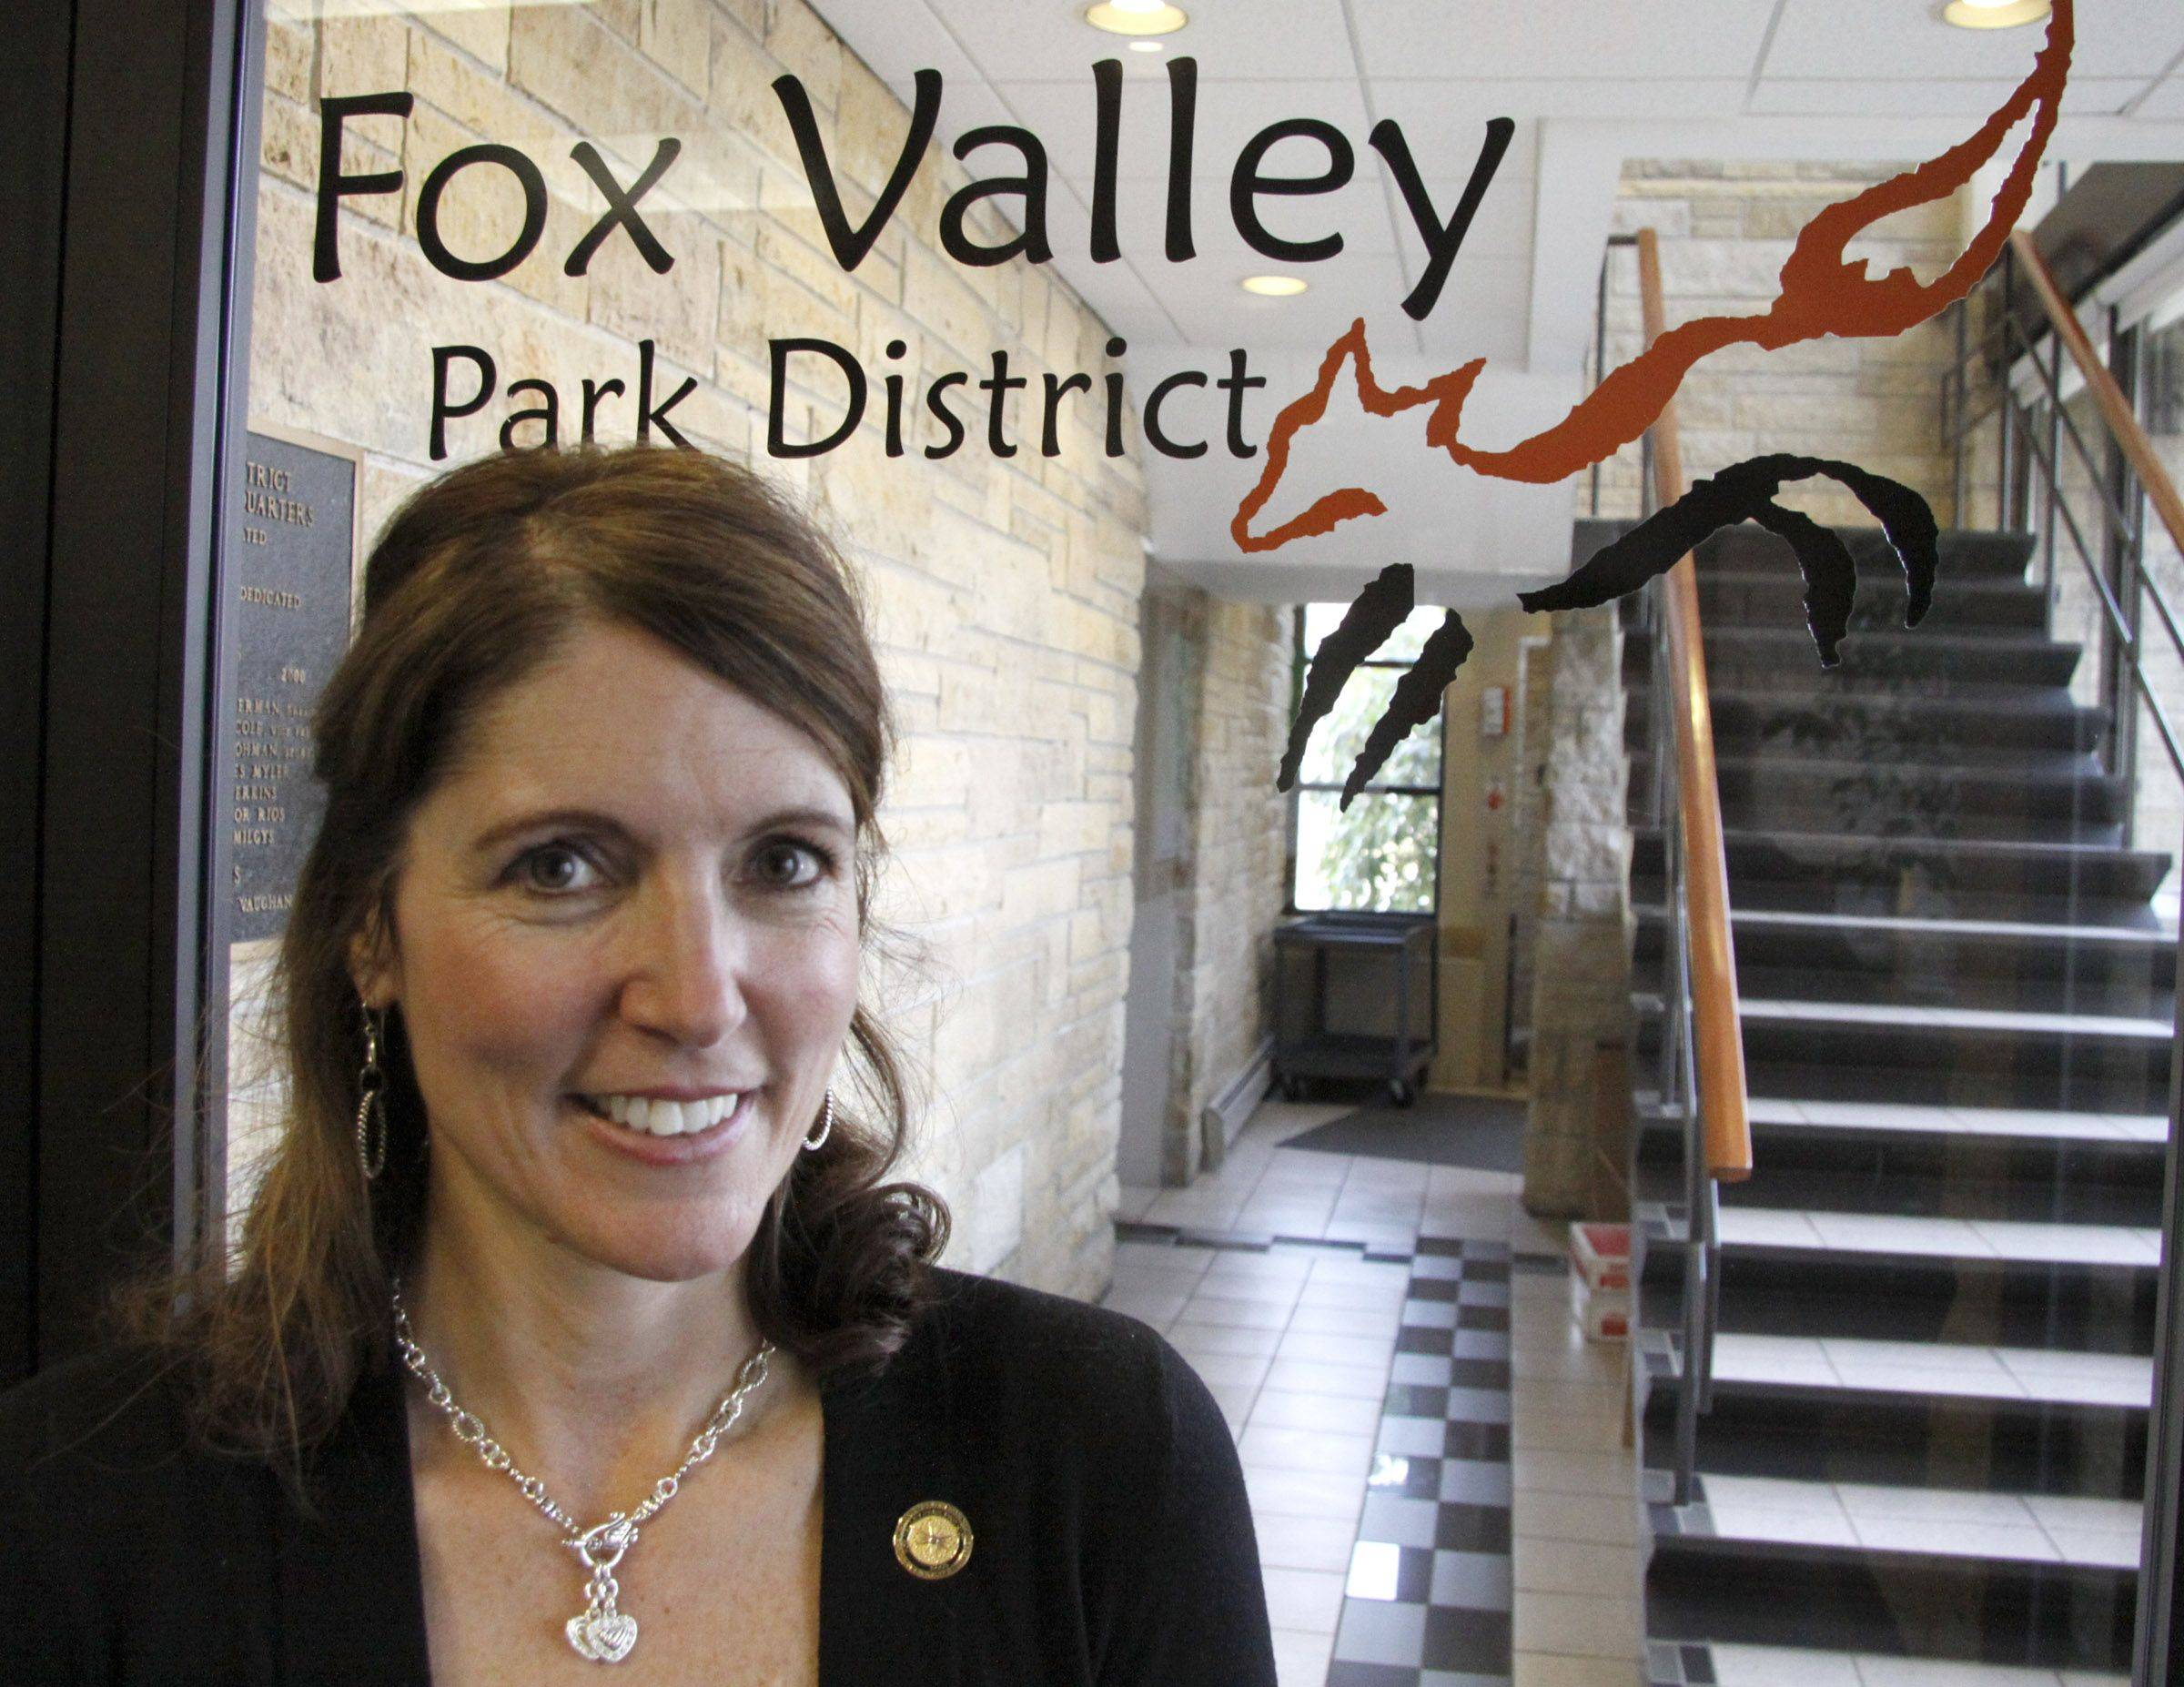 Fox Valley Park District Fox Valley Park District